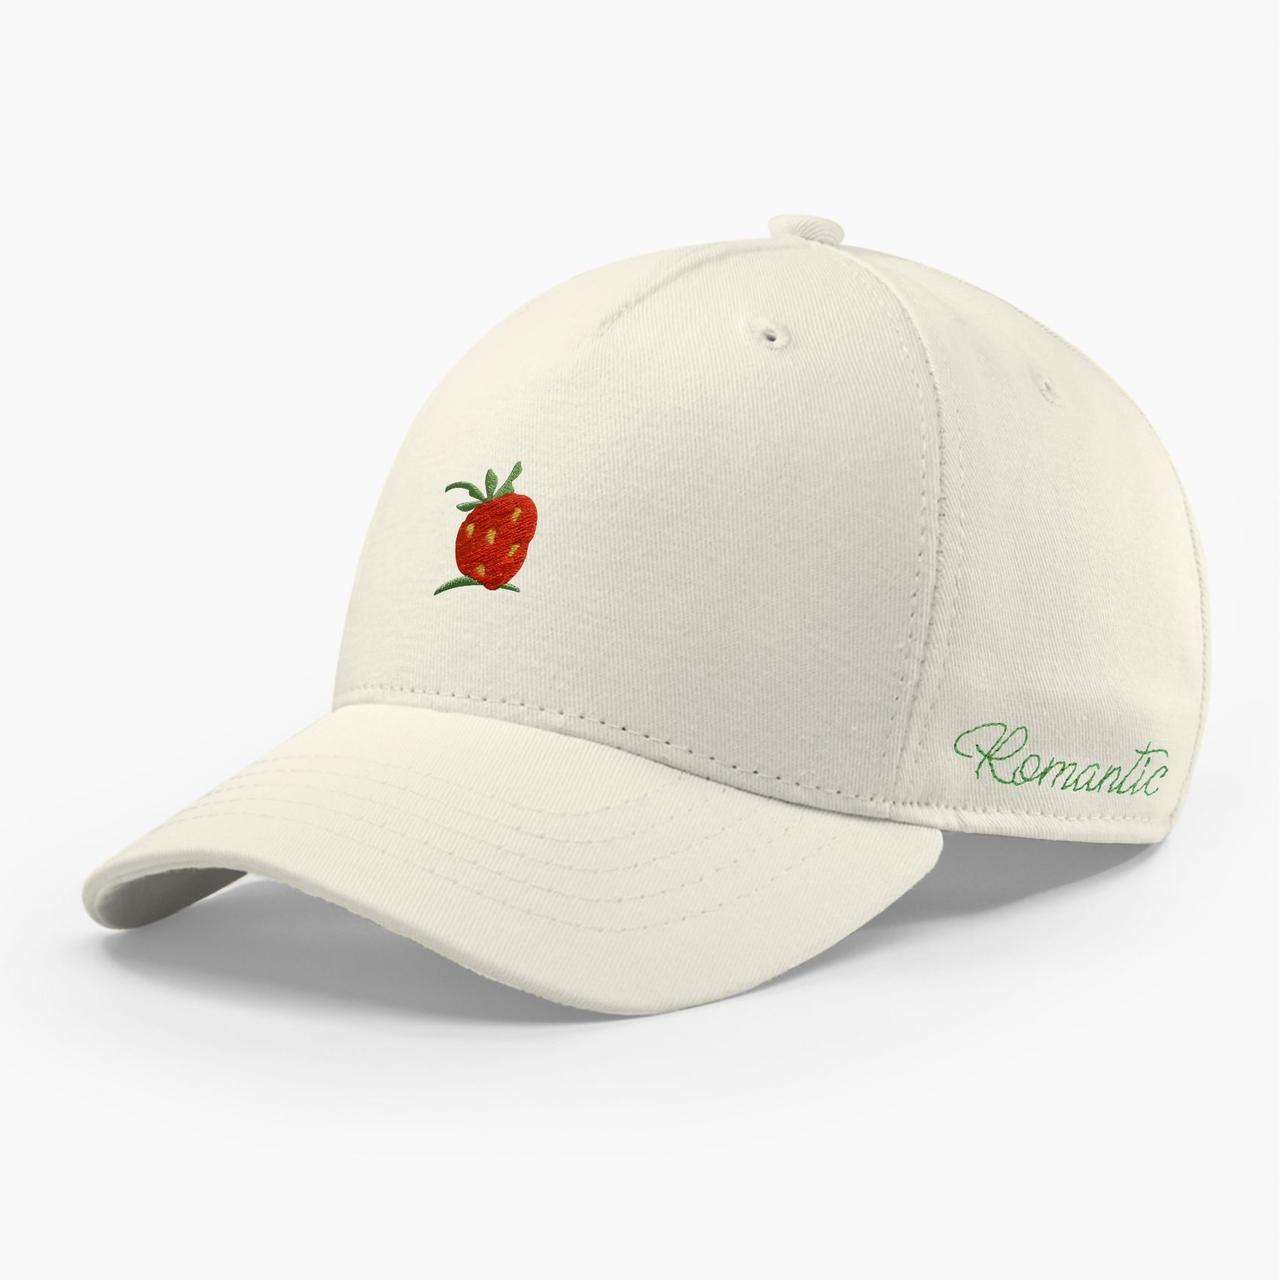 Женская кепка бейсболка INAL strawberry S / 53-54 RU Молочный 285053